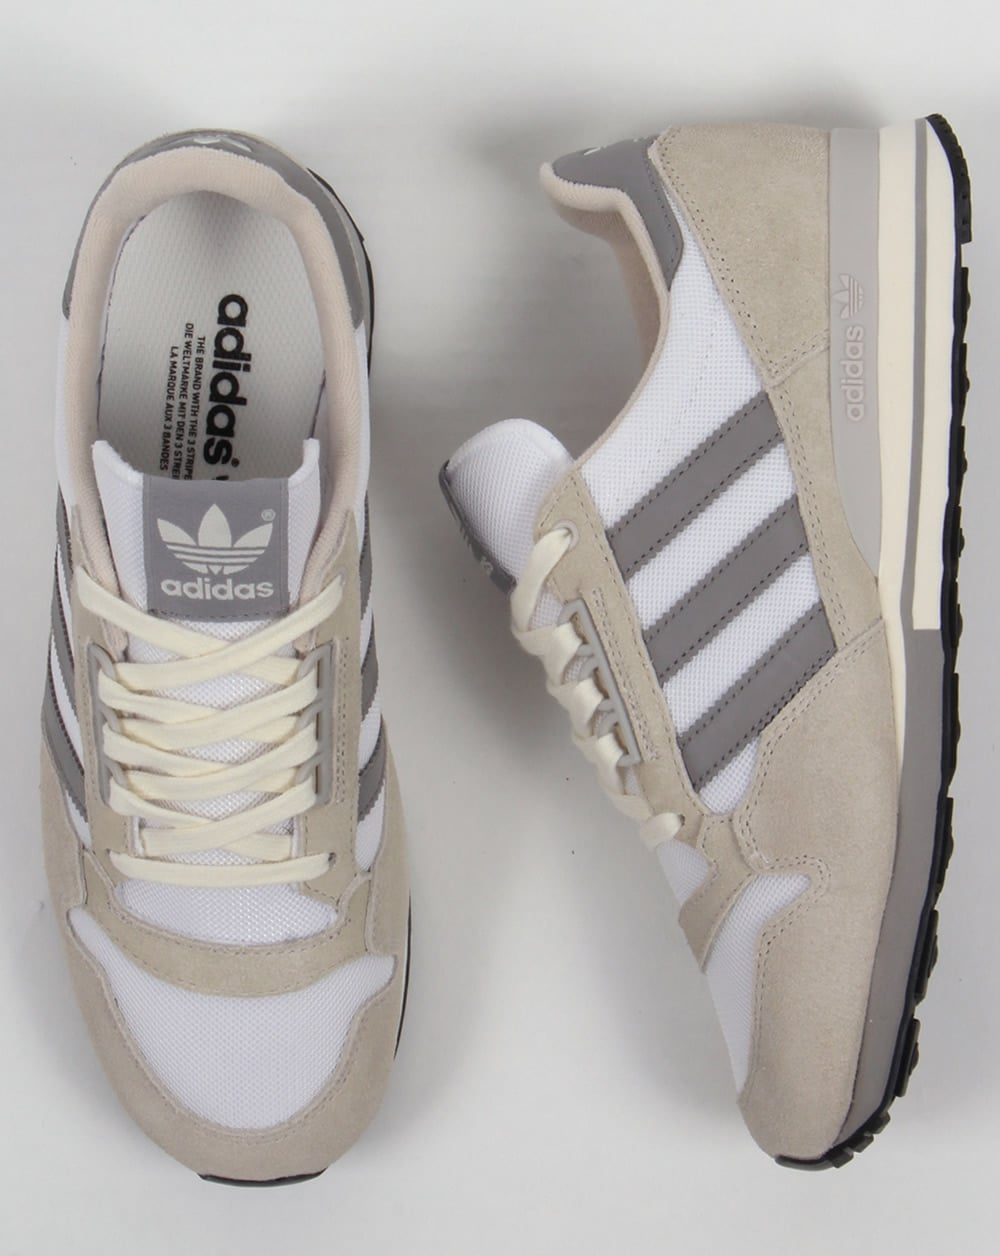 Gris Blanco Adidas Zx 500 Og DcNyW